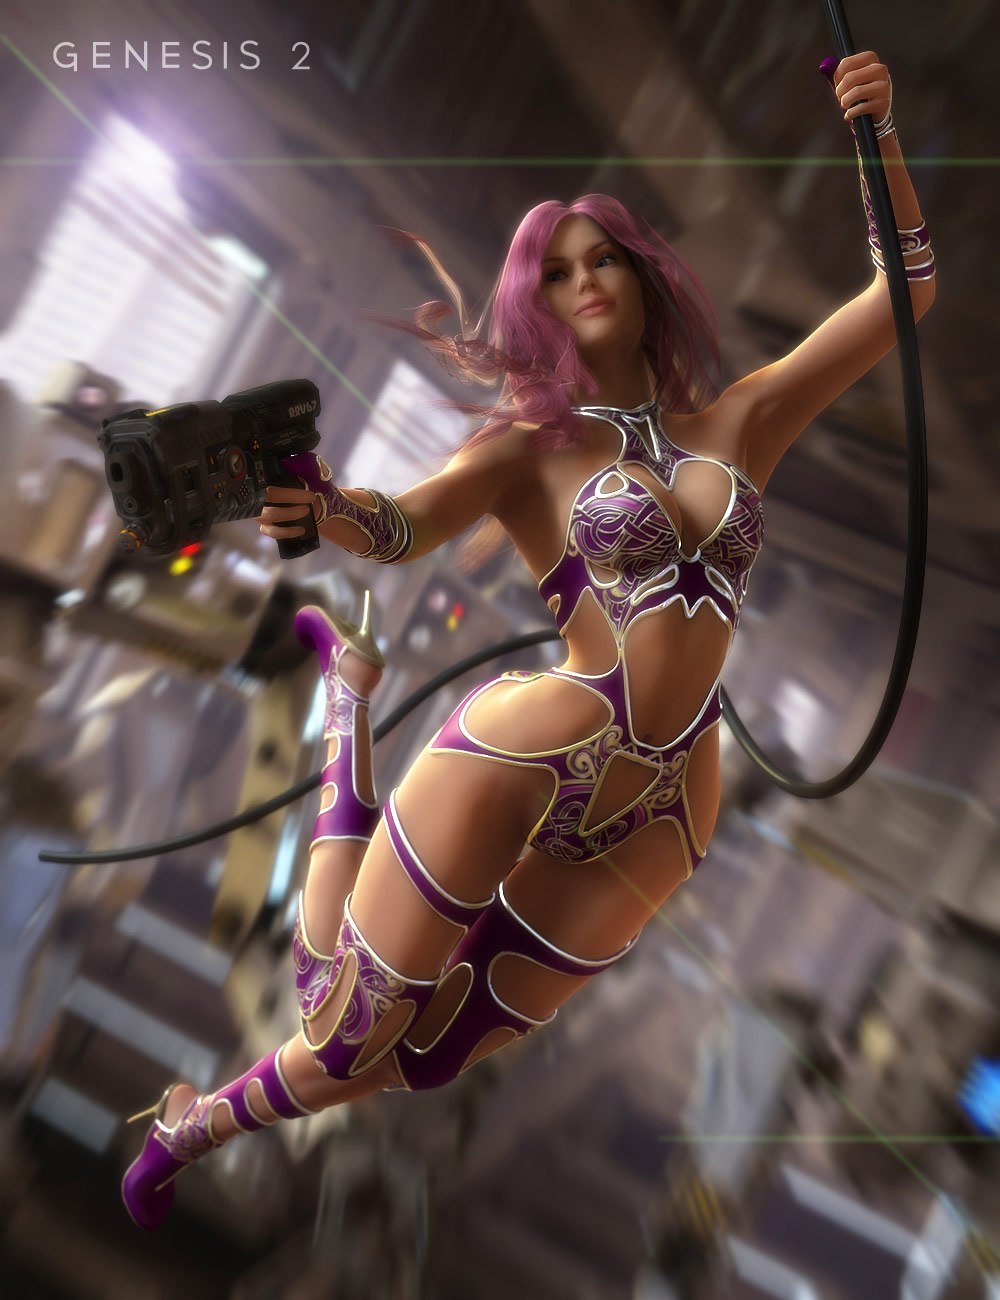 Leris Outfit for Genesis 2 Female(s) by: Nikisatez, 3D Models by Daz 3D